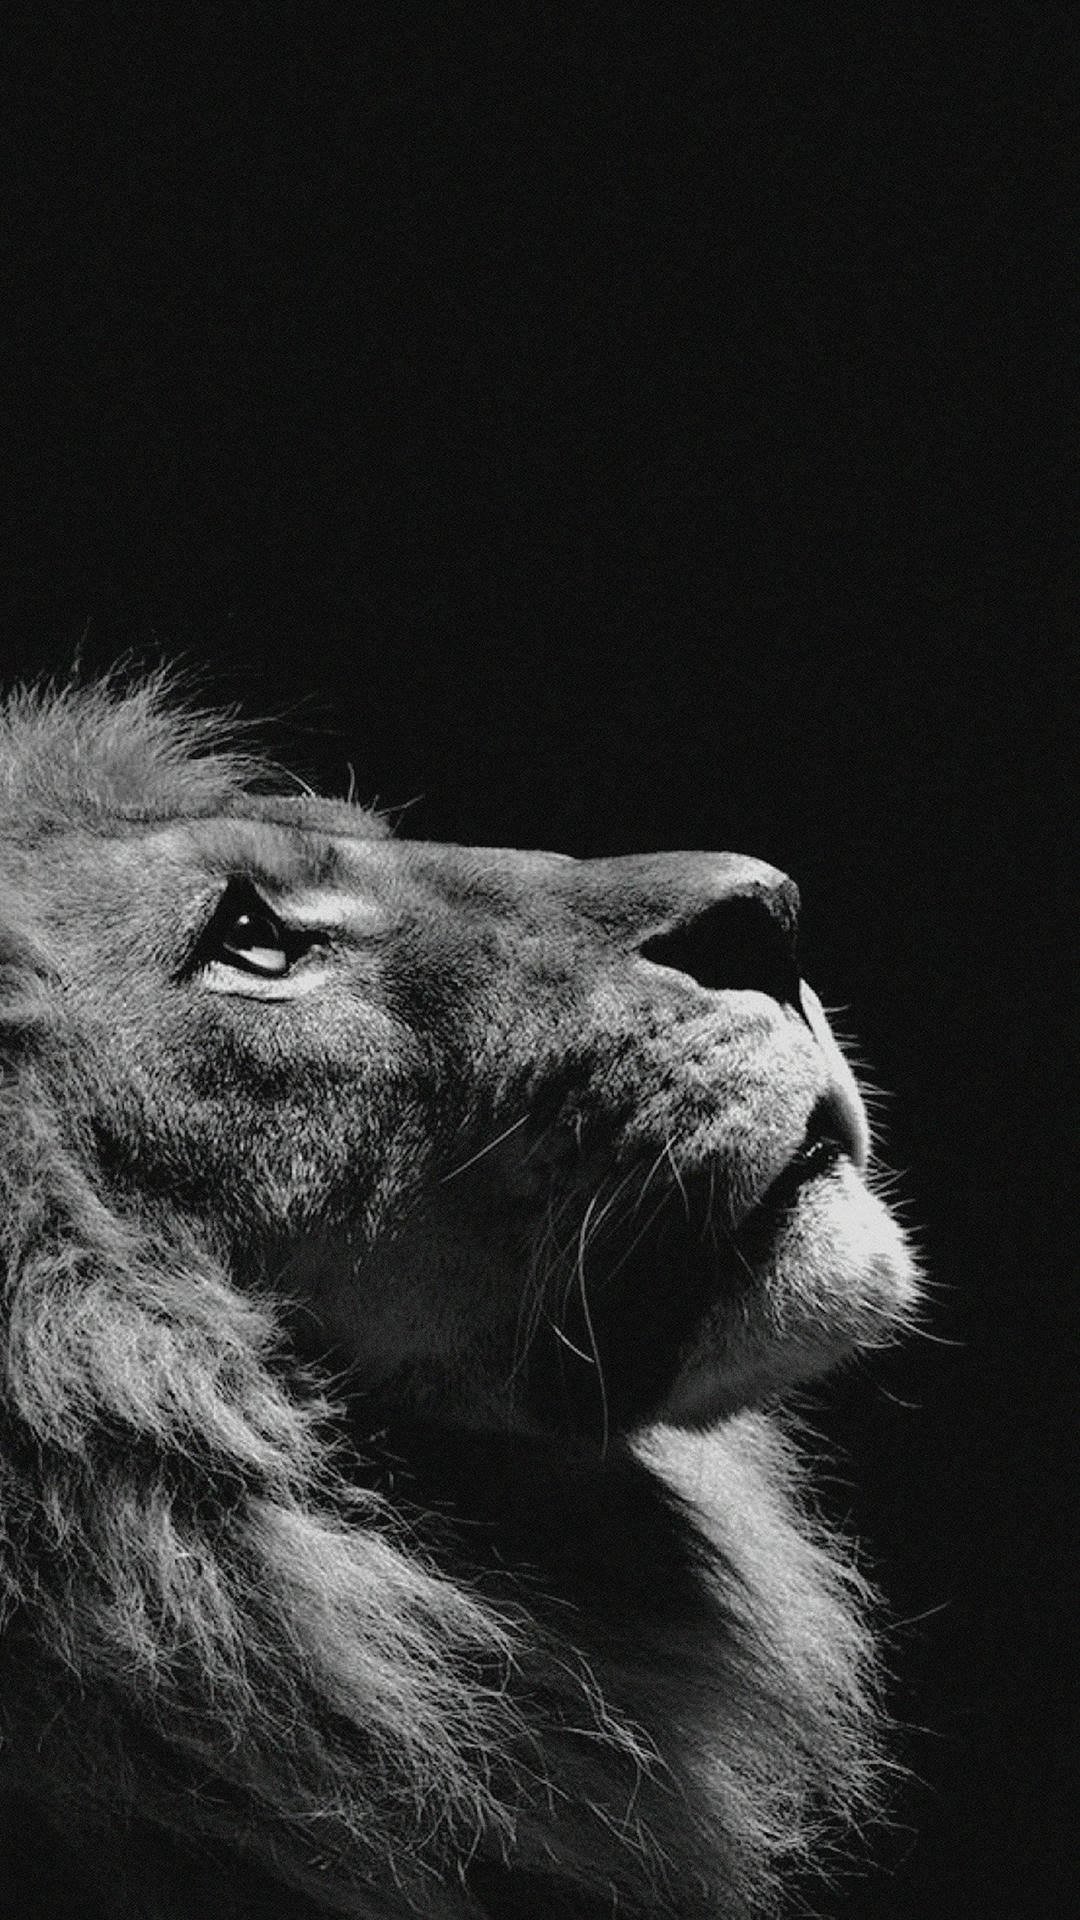 wallpaper.wiki-Lion-Looking-Sky-Animal-Nature-Dark-